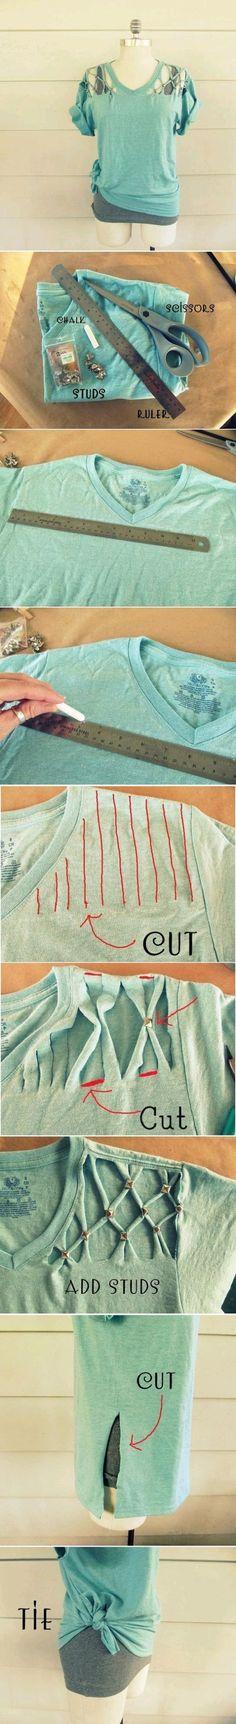 Creative ideas bring awesome result #OJK5KRun costume ideas ;)